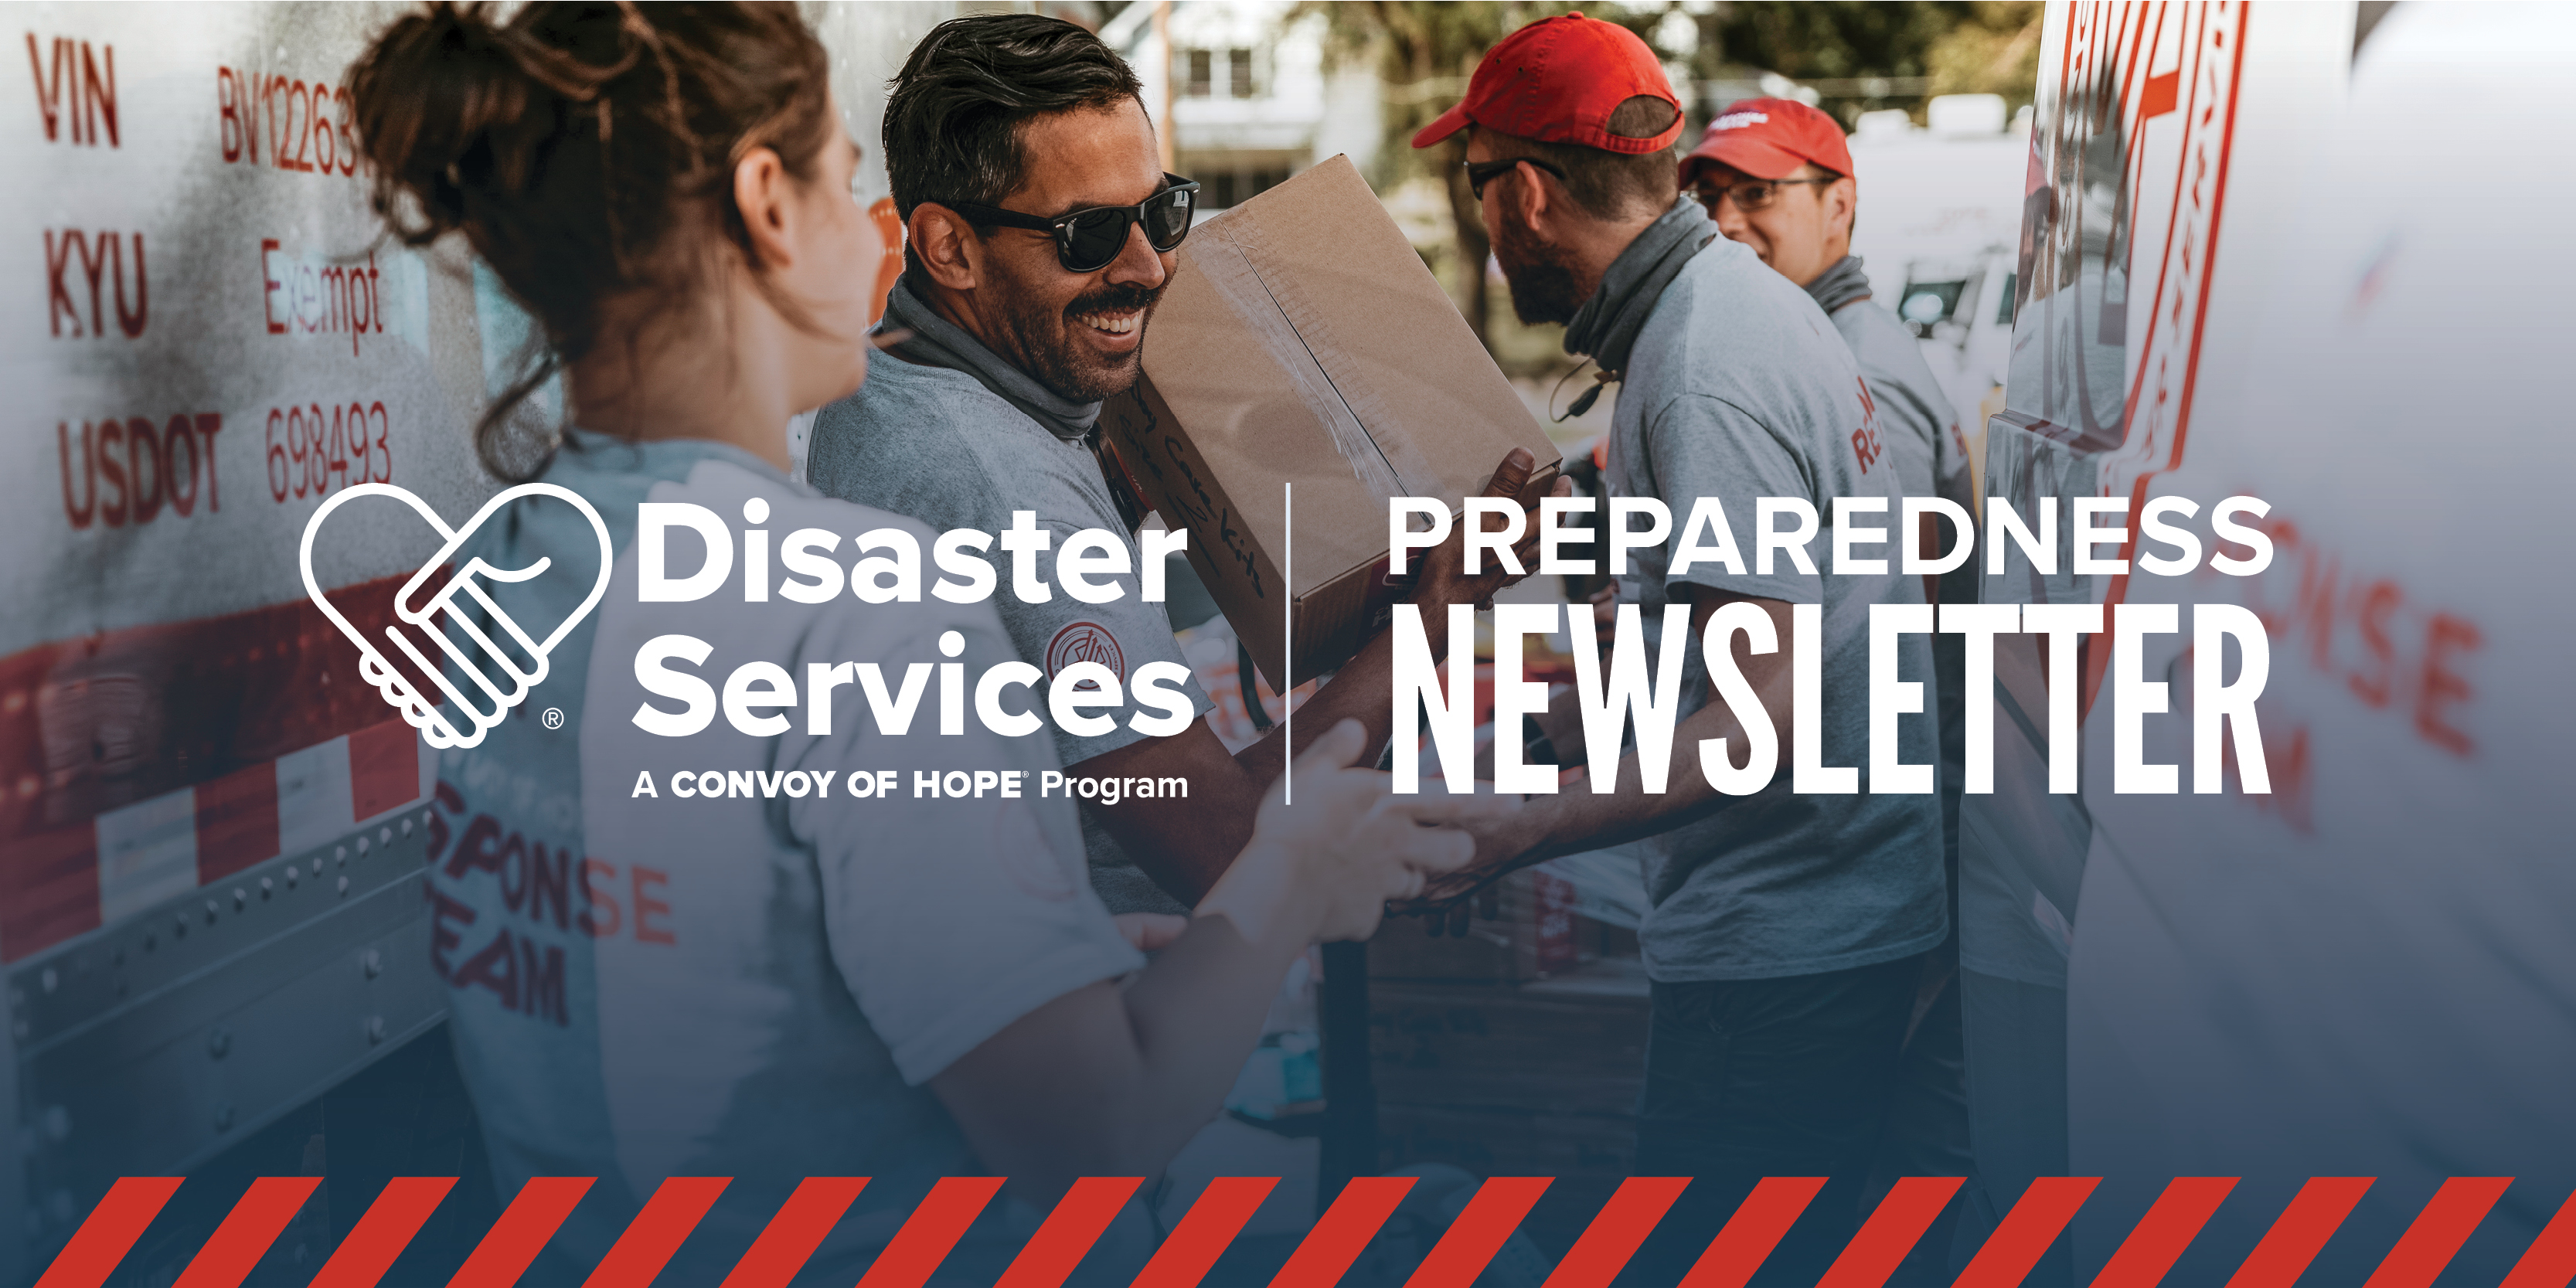 Disaster Services Preparedness Newsletter Header